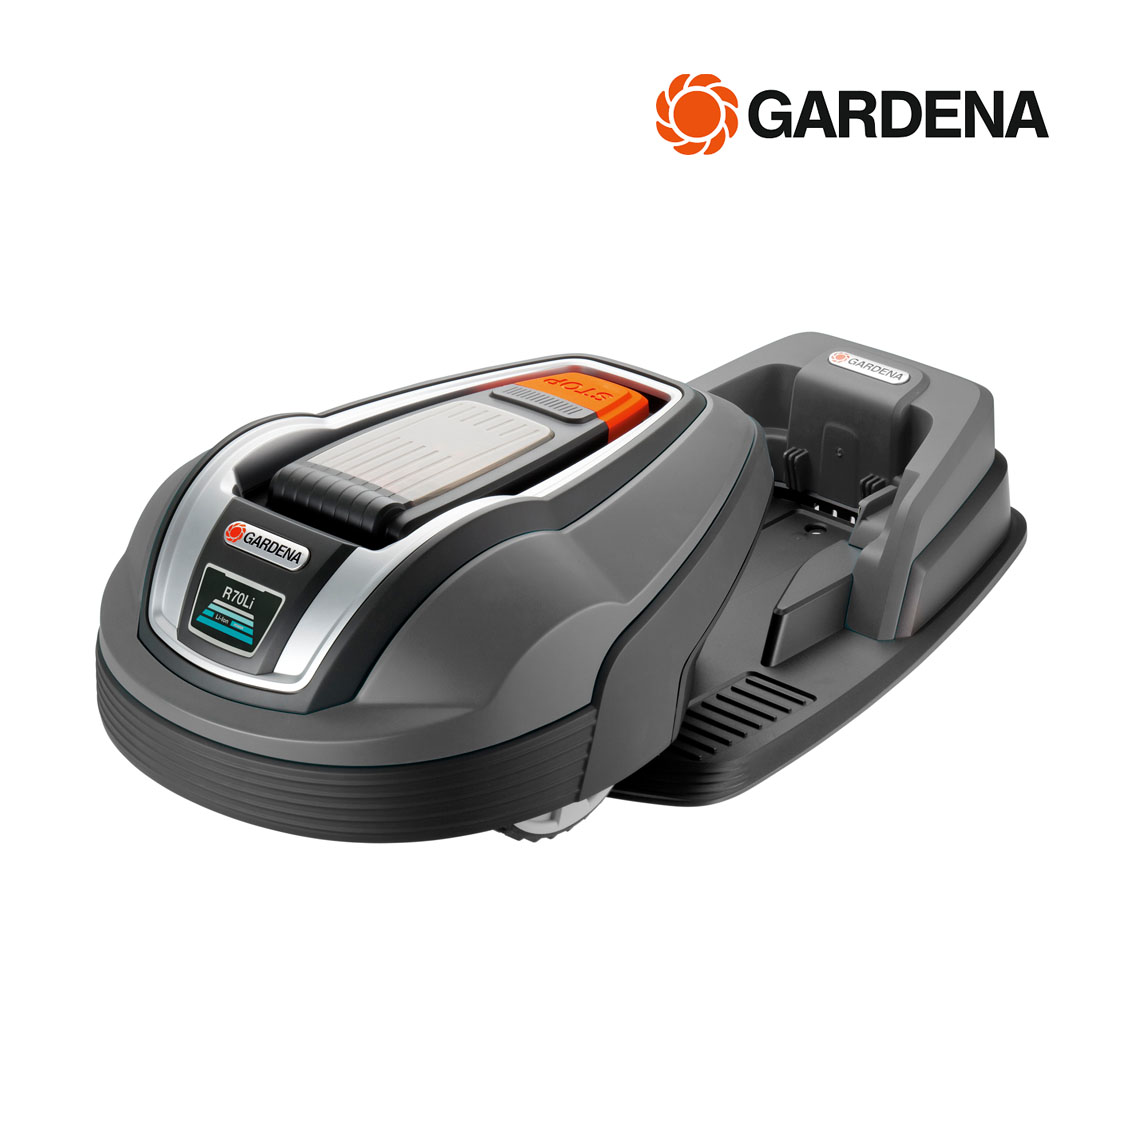 gardena - tondeuse robot r70li 4072-66 - distriartisan